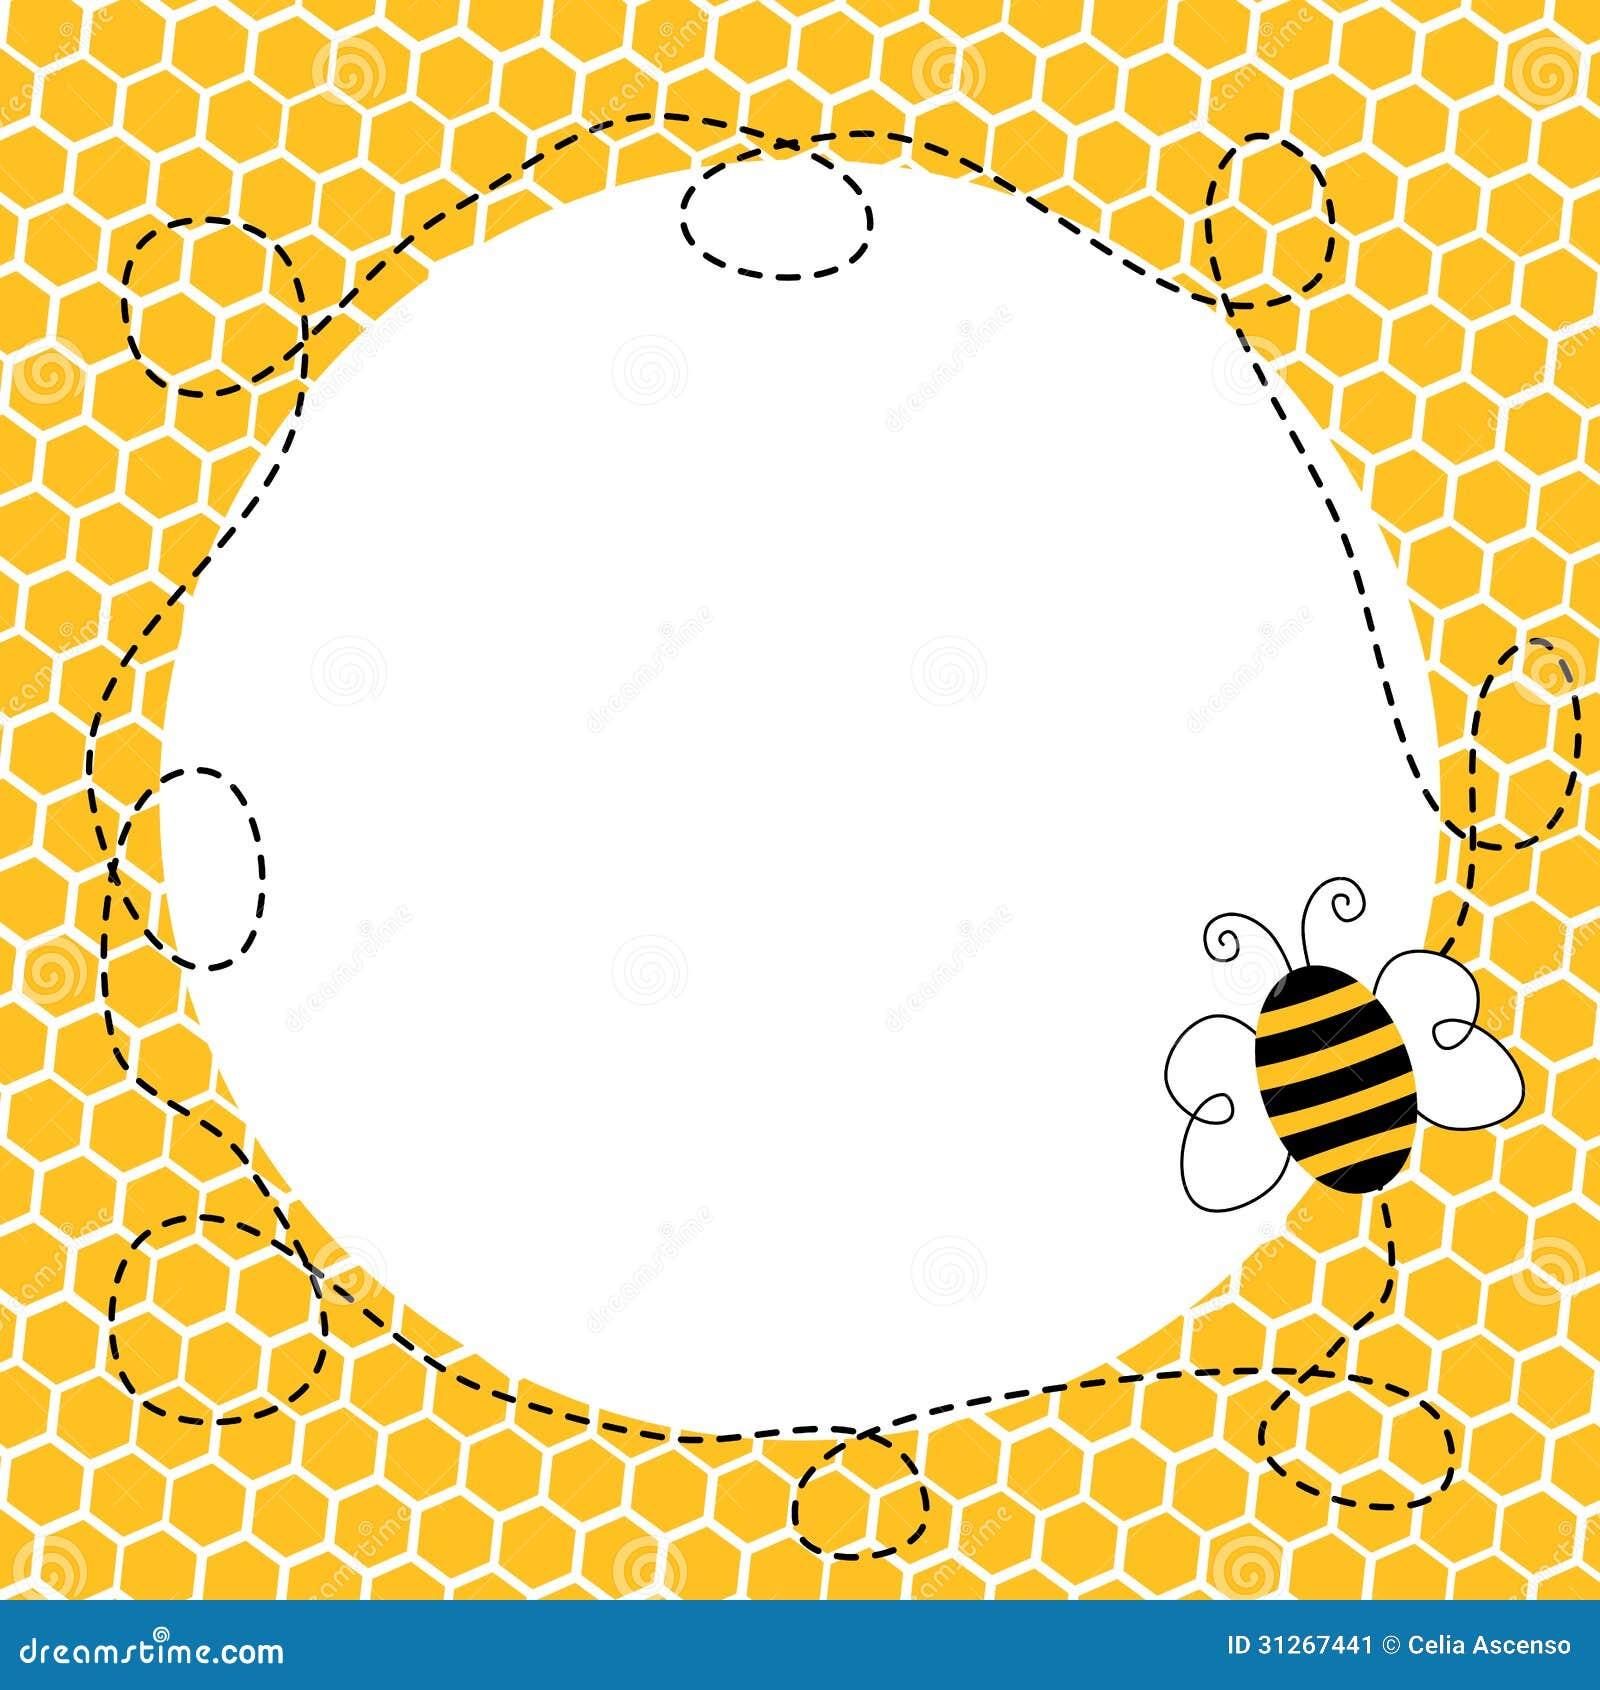 Flygbi i en honungskakaram